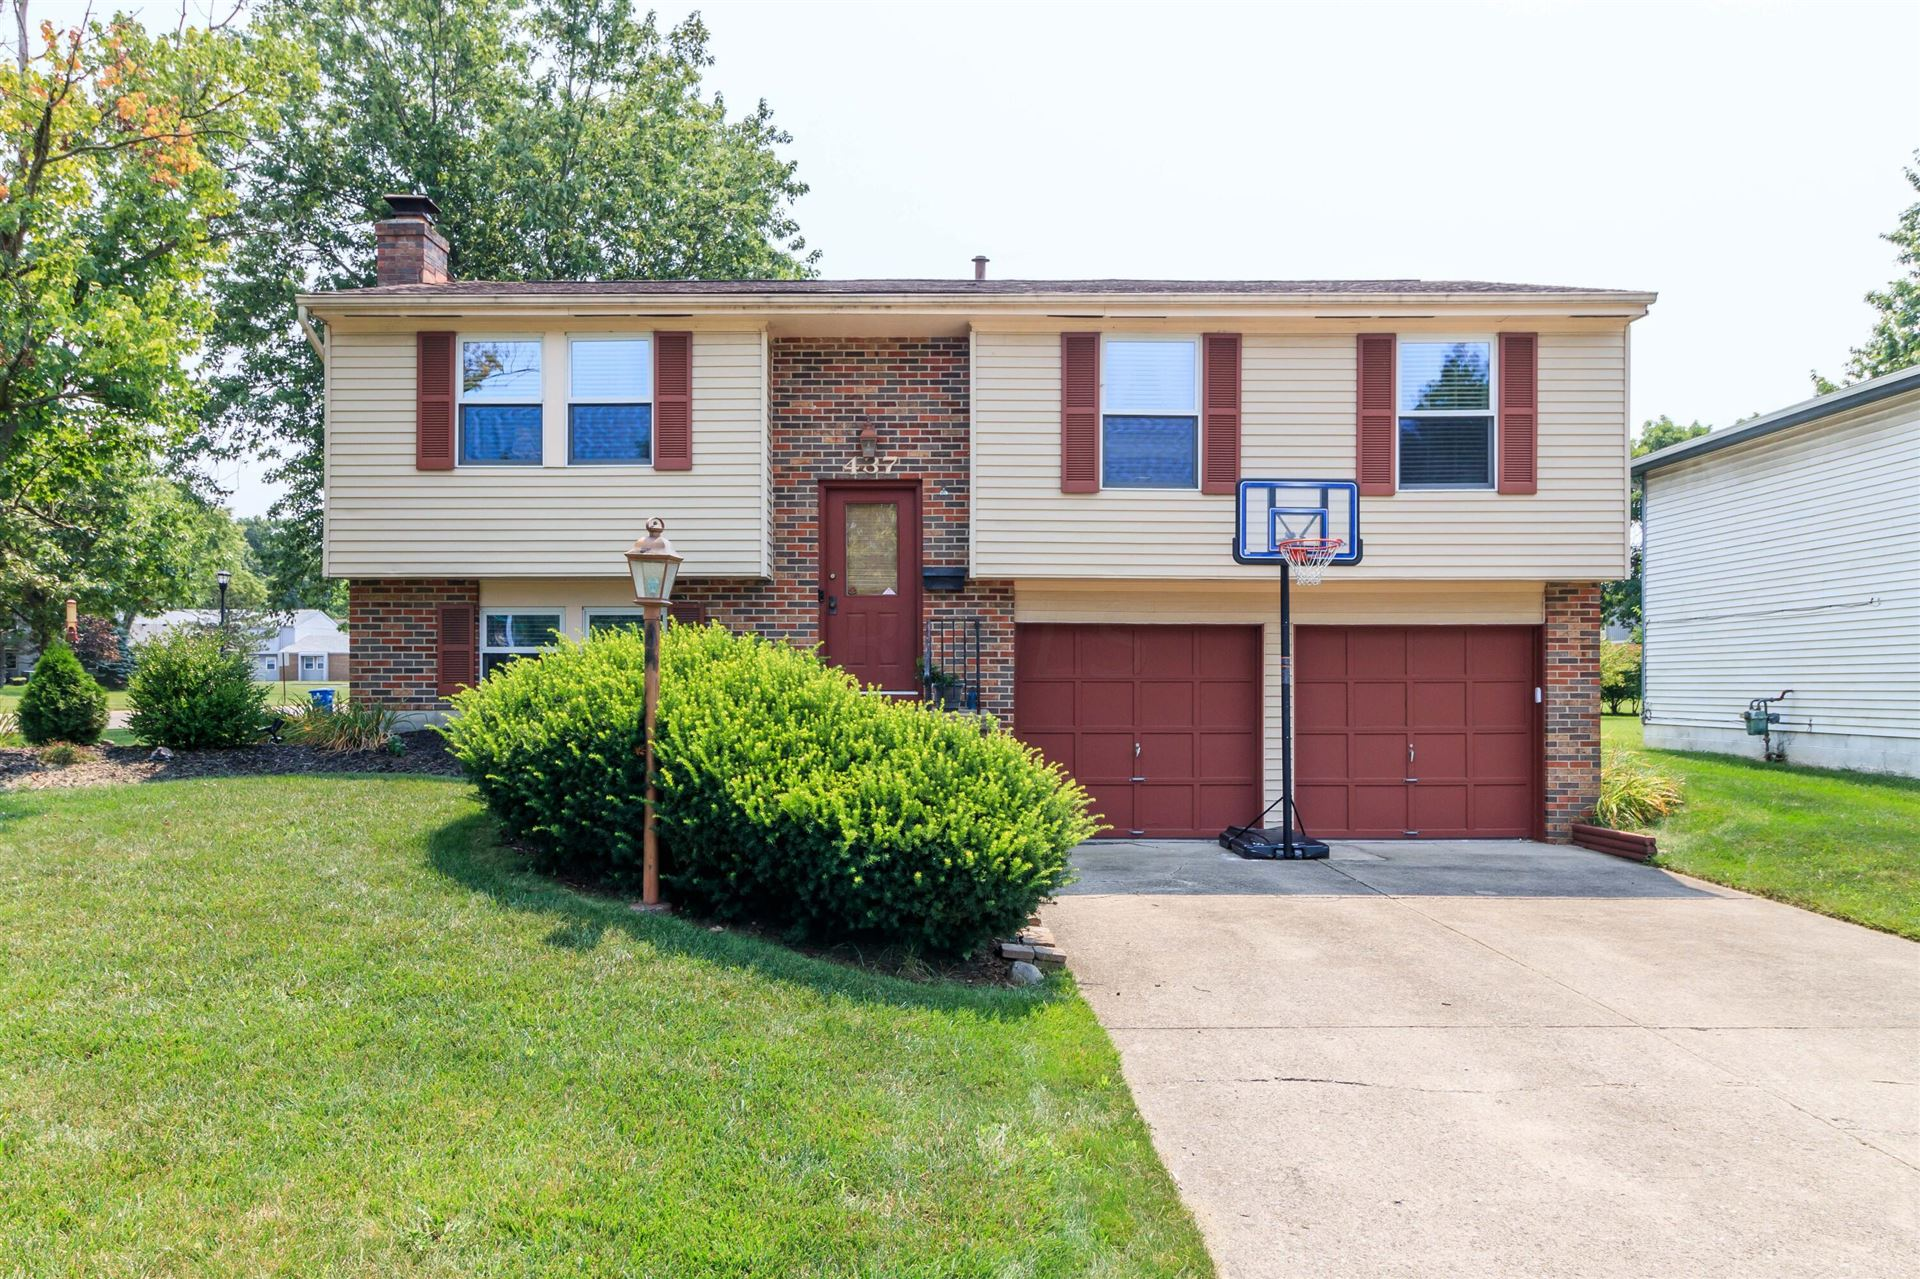 Photo of 437 Huber Village Boulevard, Westerville, OH 43081 (MLS # 221028554)